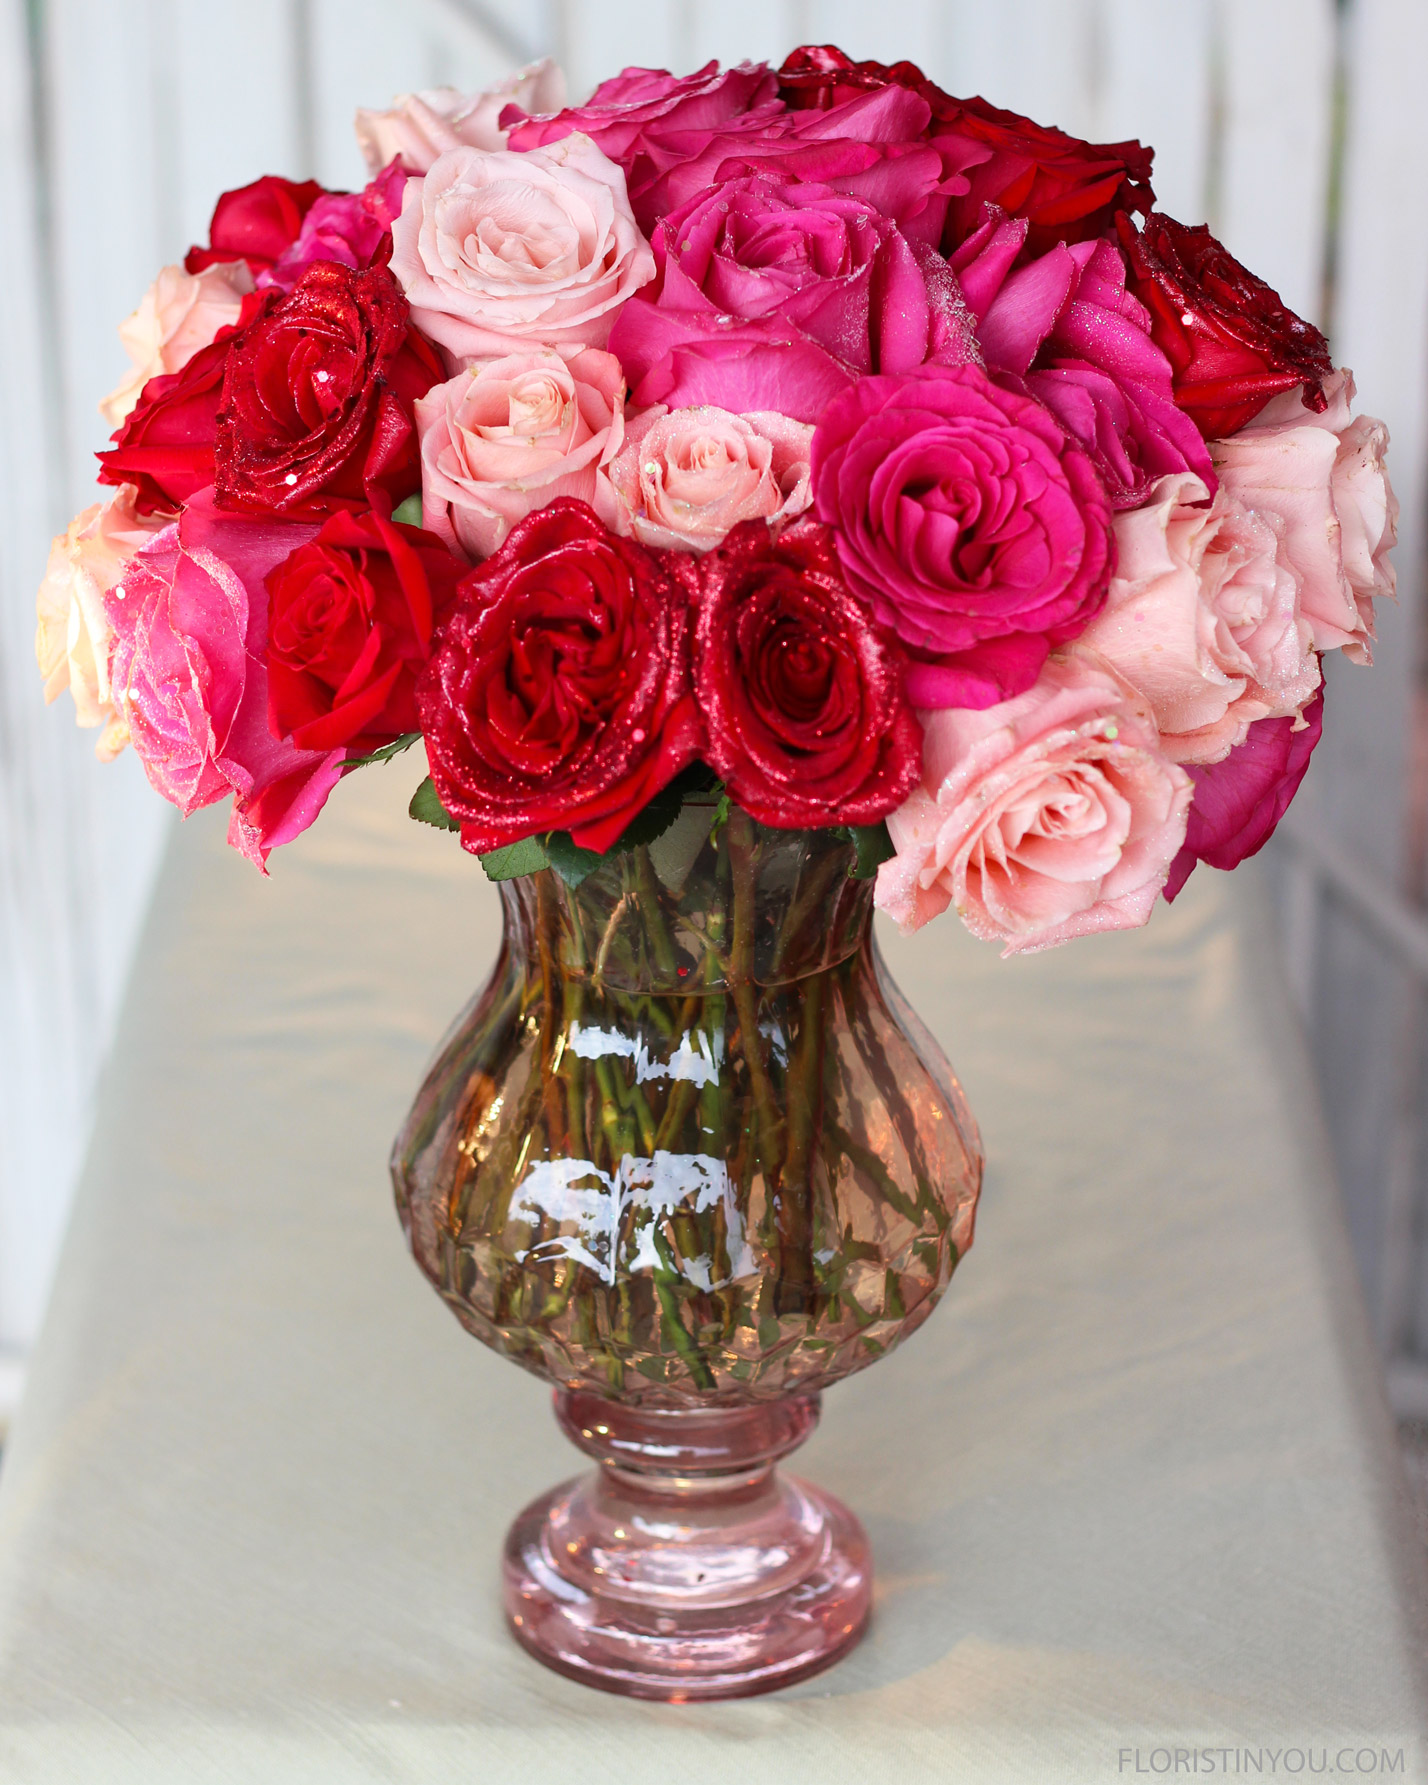 "Valentine's Day Glitter Roses                     Normal   0           false   false   false     EN-US   JA   X-NONE                                                                                                                                                                                                                                                                                                                                                                              /* Style Definitions */ table.MsoNormalTable {mso-style-name:""Table Normal""; mso-tstyle-rowband-size:0; mso-tstyle-colband-size:0; mso-style-noshow:yes; mso-style-priority:99; mso-style-parent:""""; mso-padding-alt:0in 5.4pt 0in 5.4pt; mso-para-margin:0in; mso-para-margin-bottom:.0001pt; mso-pagination:widow-orphan; font-size:12.0pt; font-family:Cambria; mso-ascii-font-family:Cambria; mso-ascii-theme-font:minor-latin; mso-hansi-font-family:Cambria; mso-hansi-theme-font:minor-latin;}"